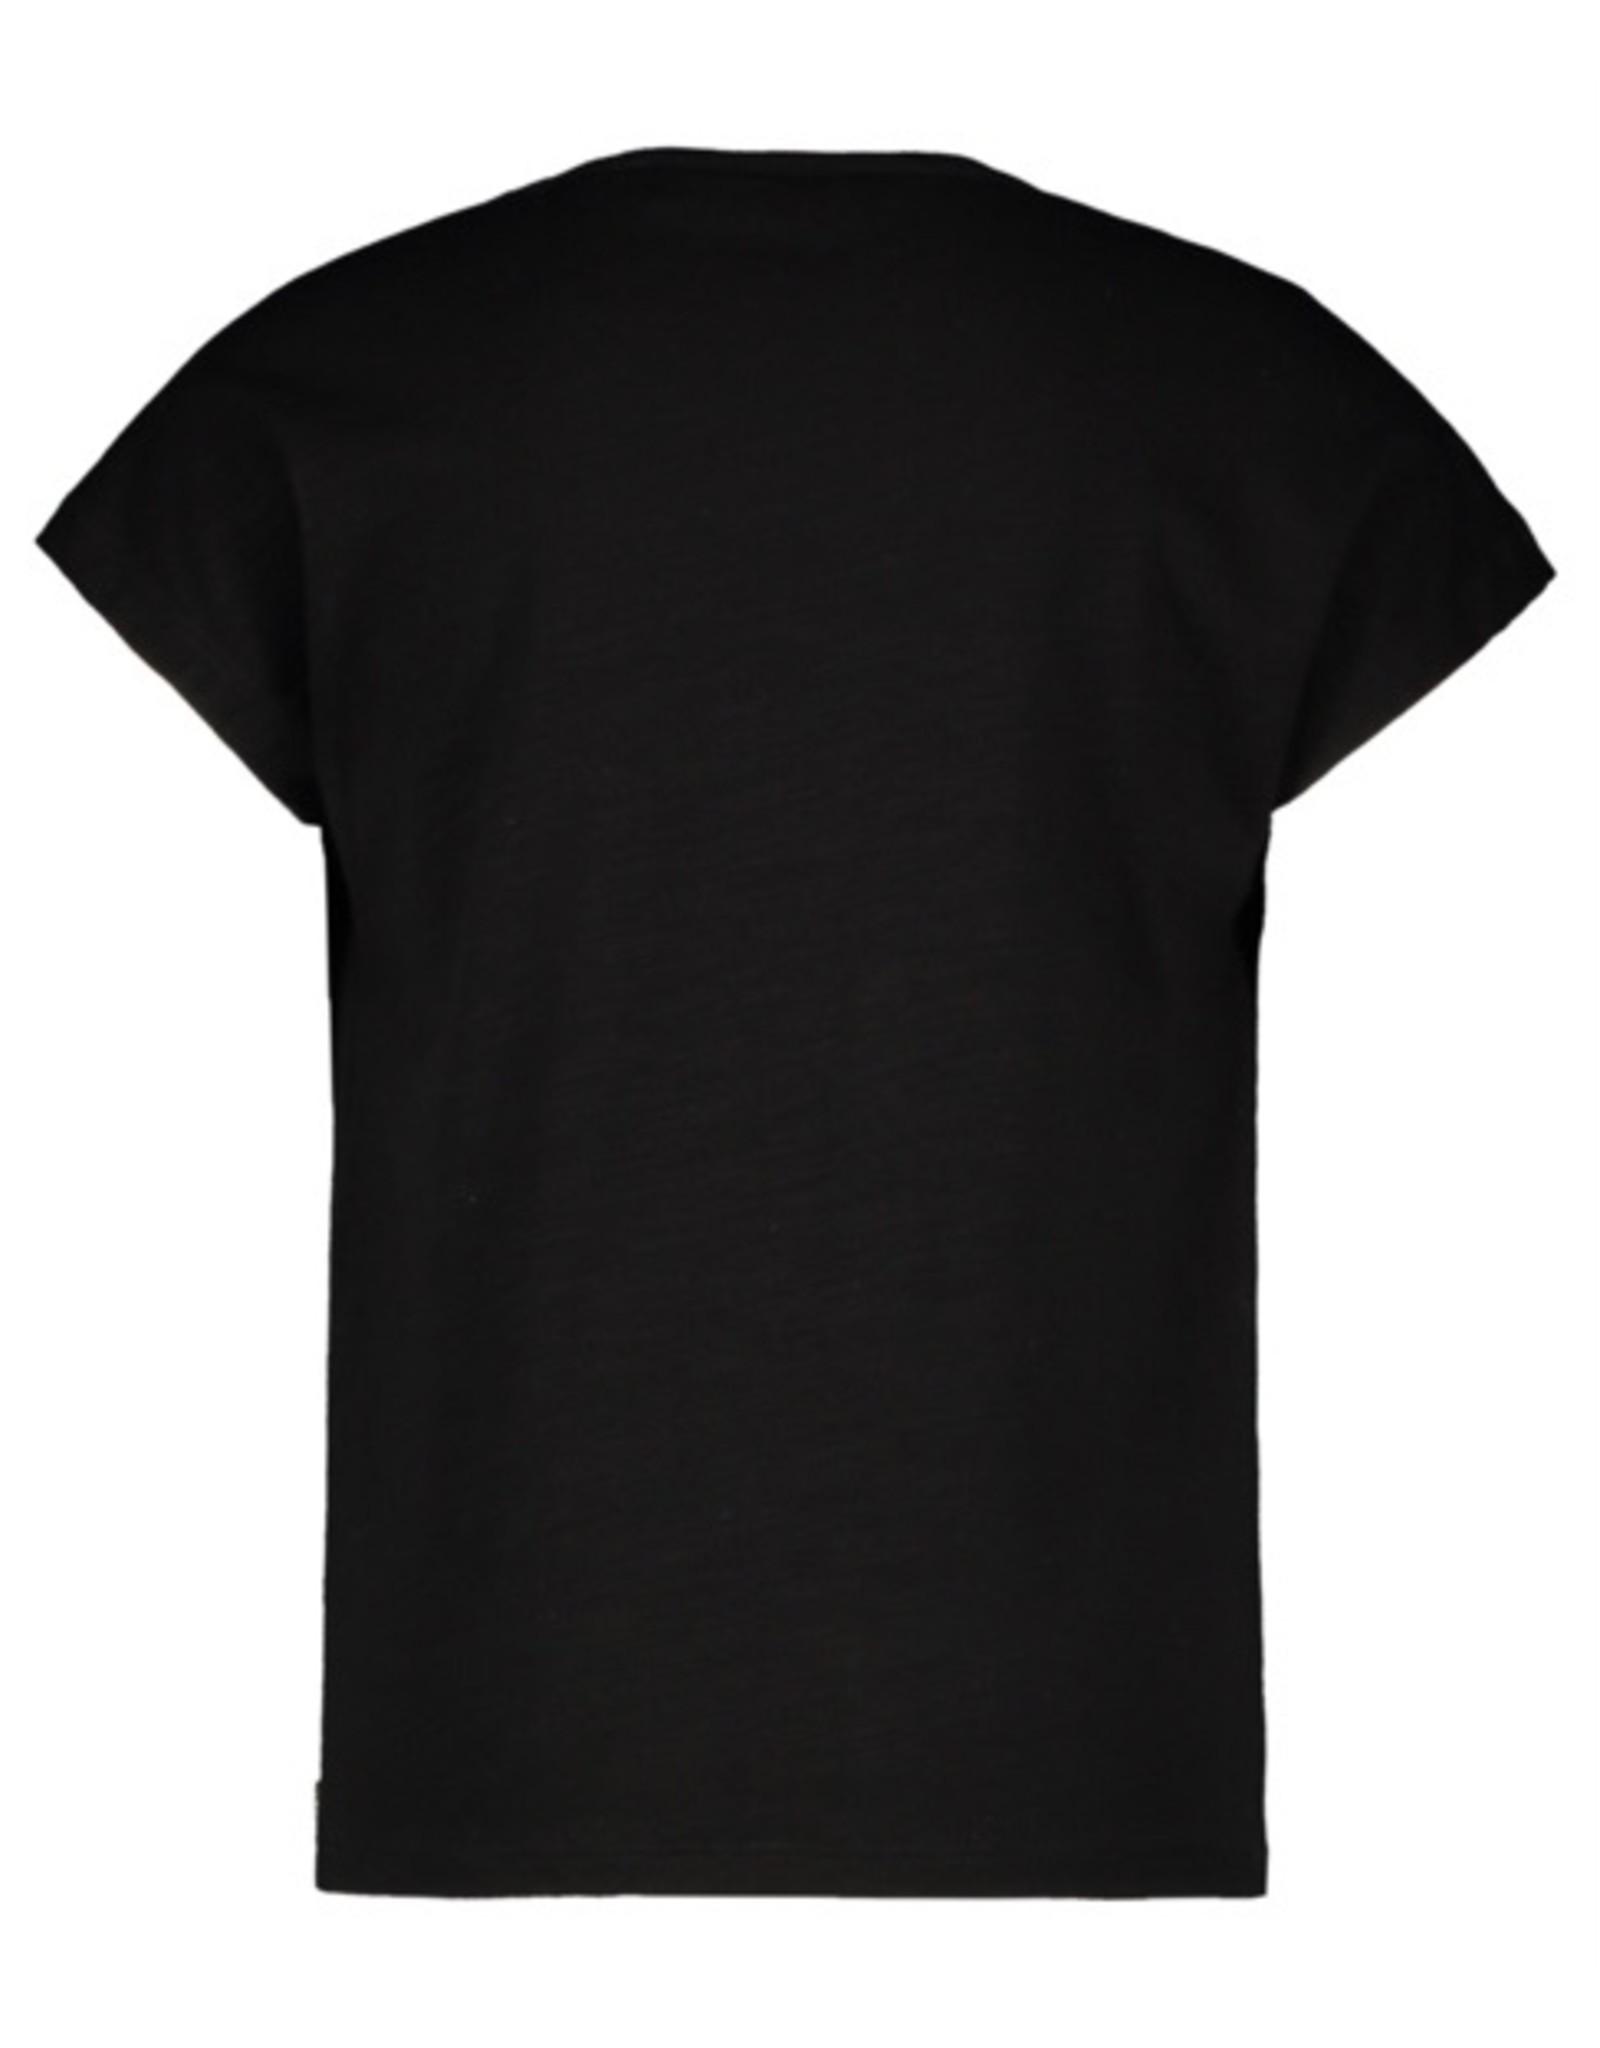 Flo F103-5440 T-Shirt